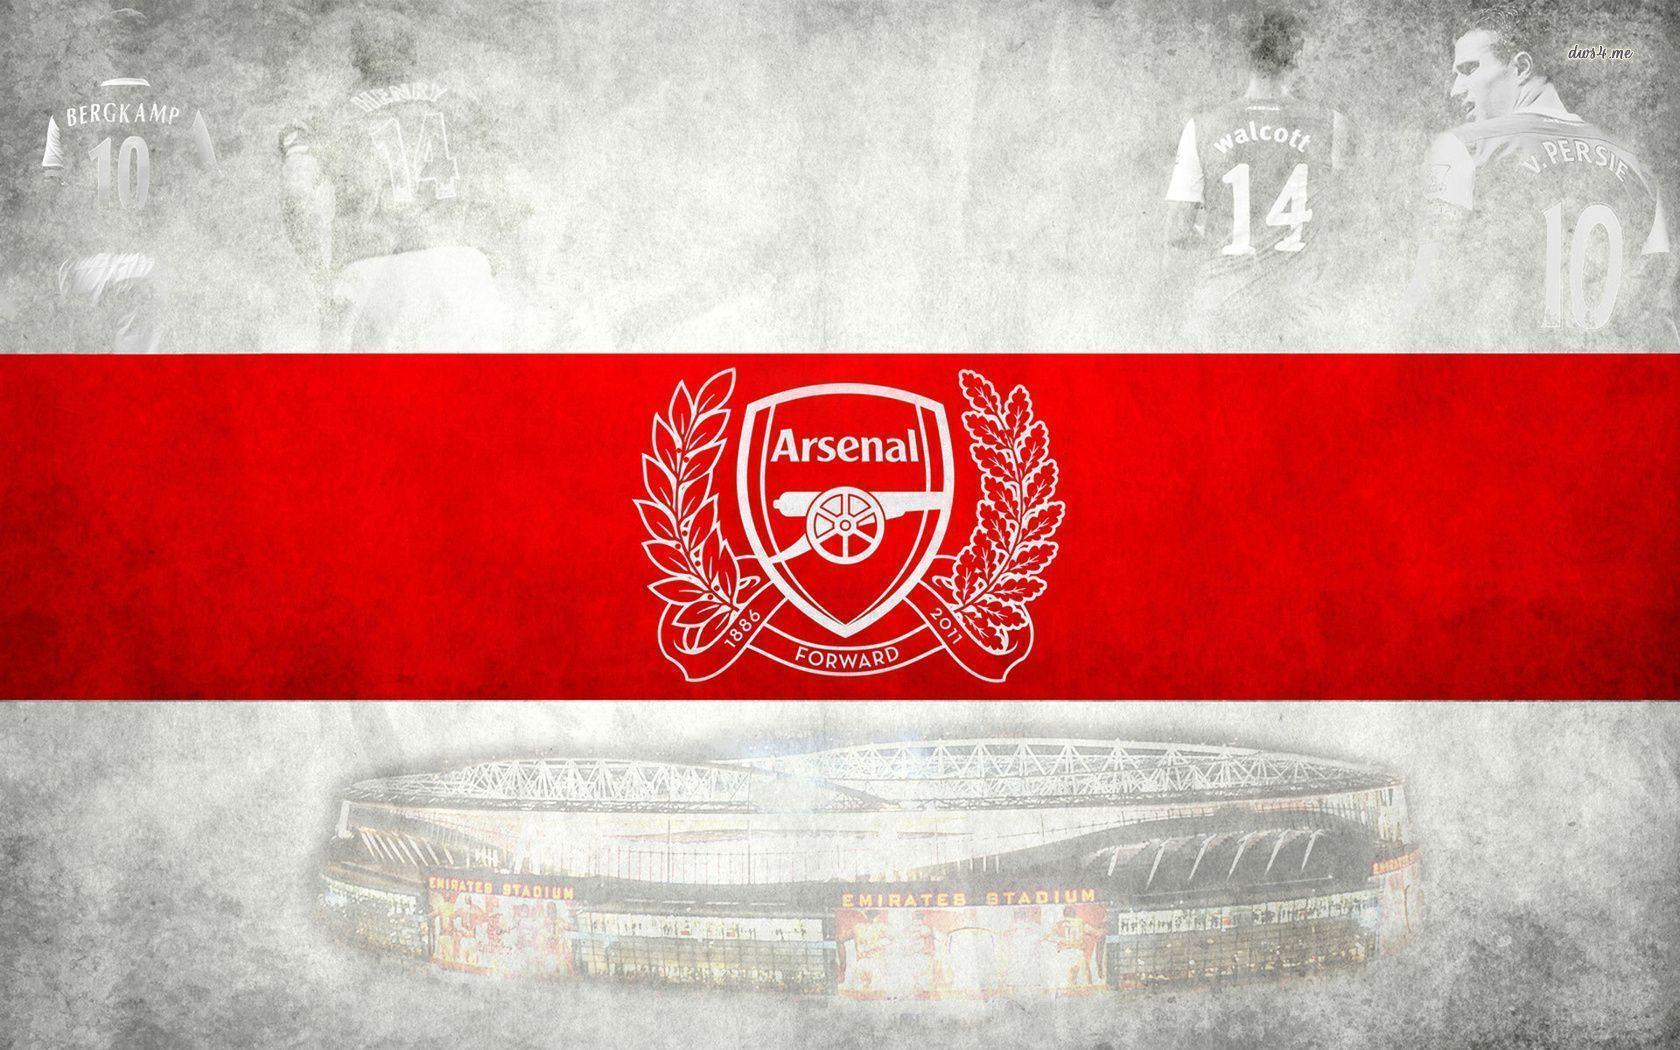 Arsenal Football Club | logos | Pinterest | Arsenal football and ...